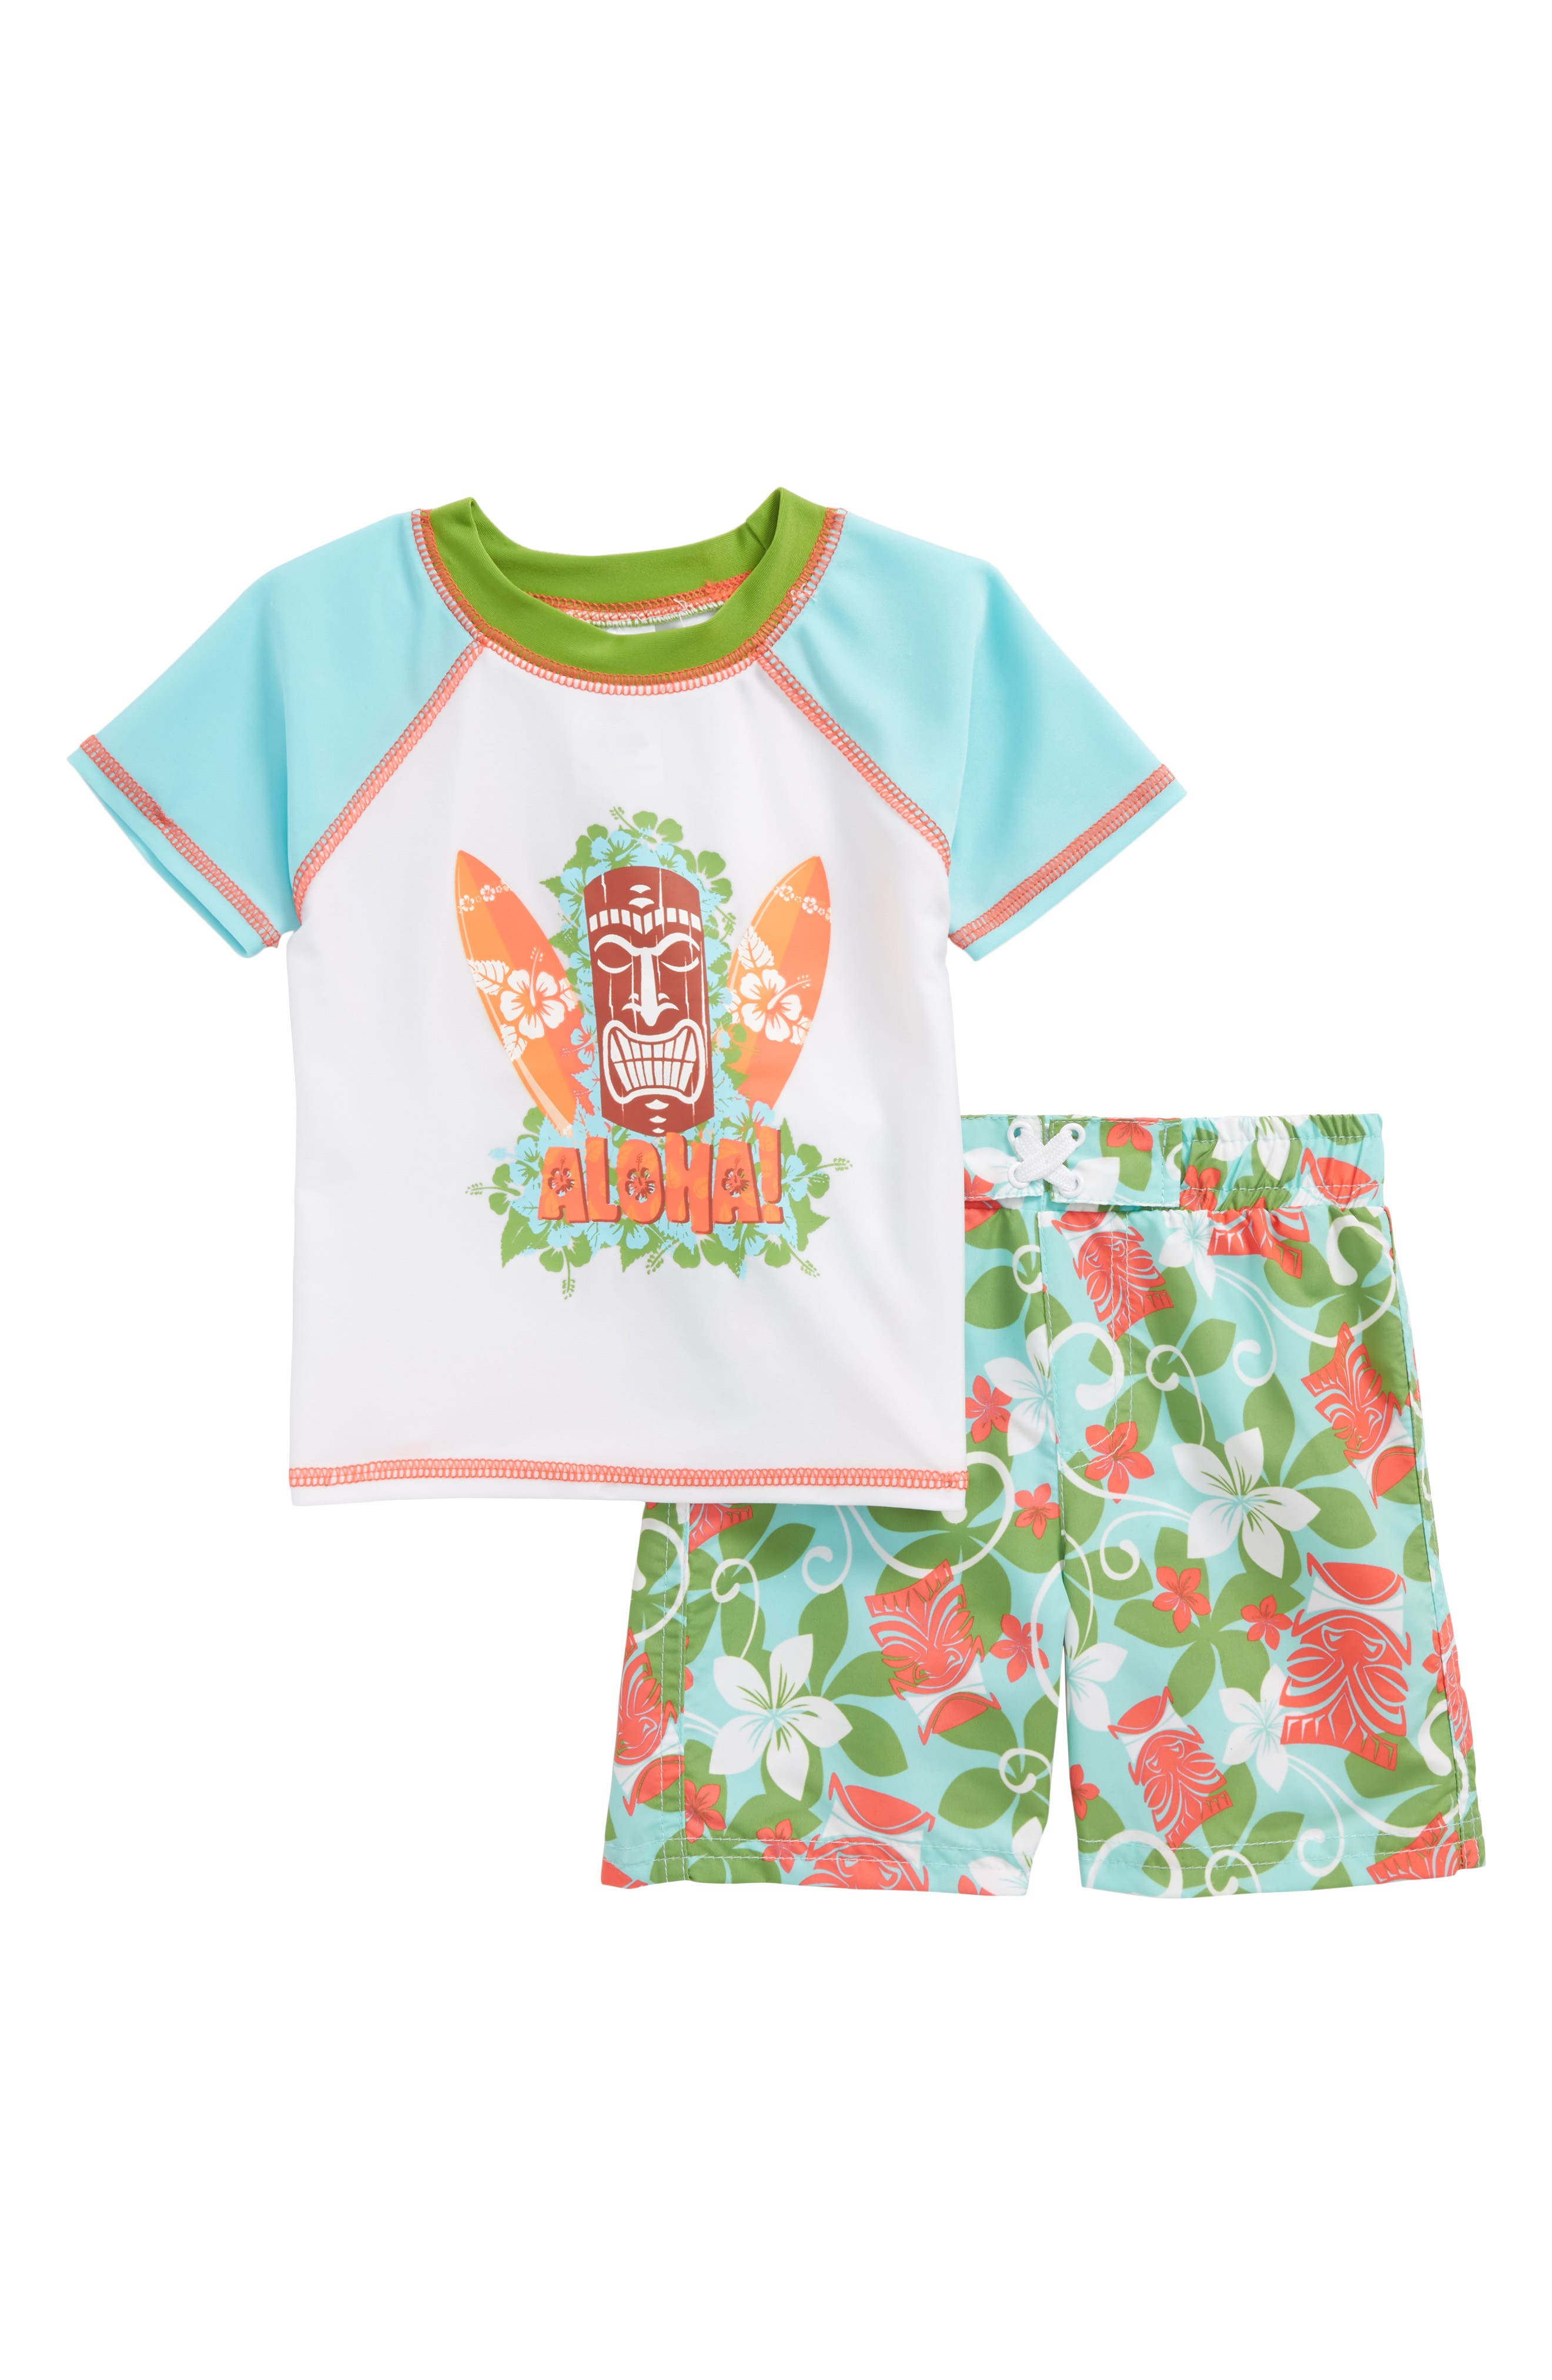 Aloha Tiki Two-Piece Rashguard Swimsuit,                             Main thumbnail 1, color,                             109